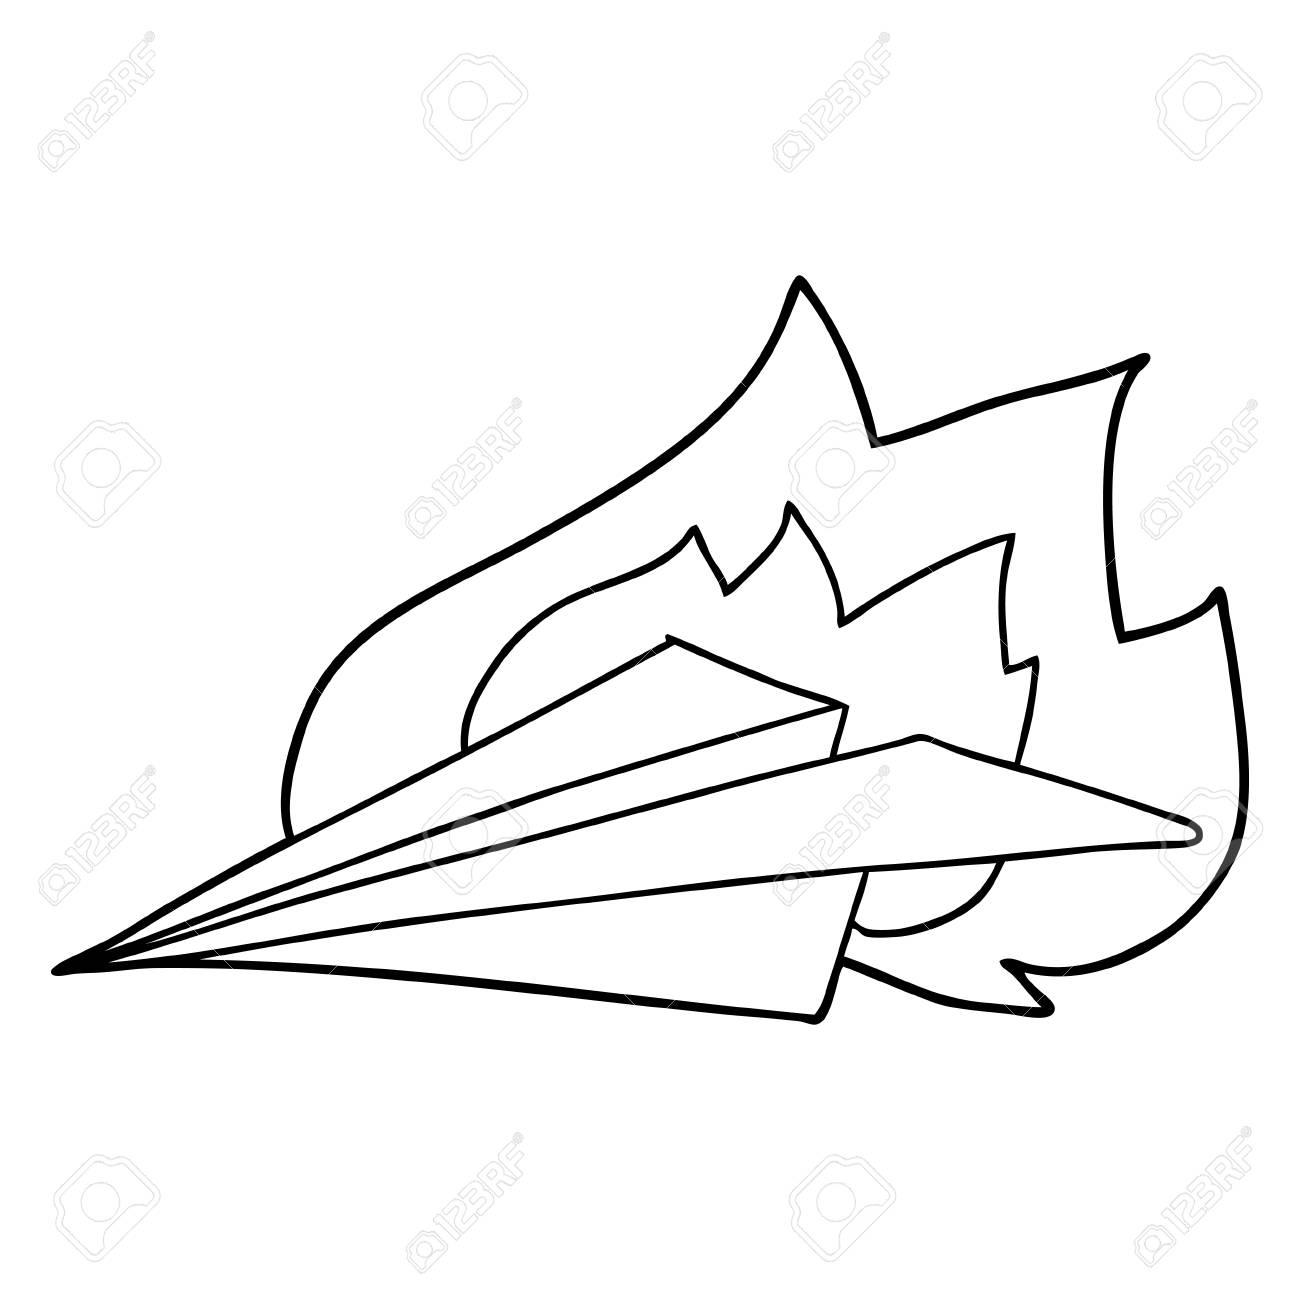 Cartoon Burning Paper Airplane Vector Illustration Royalty Free